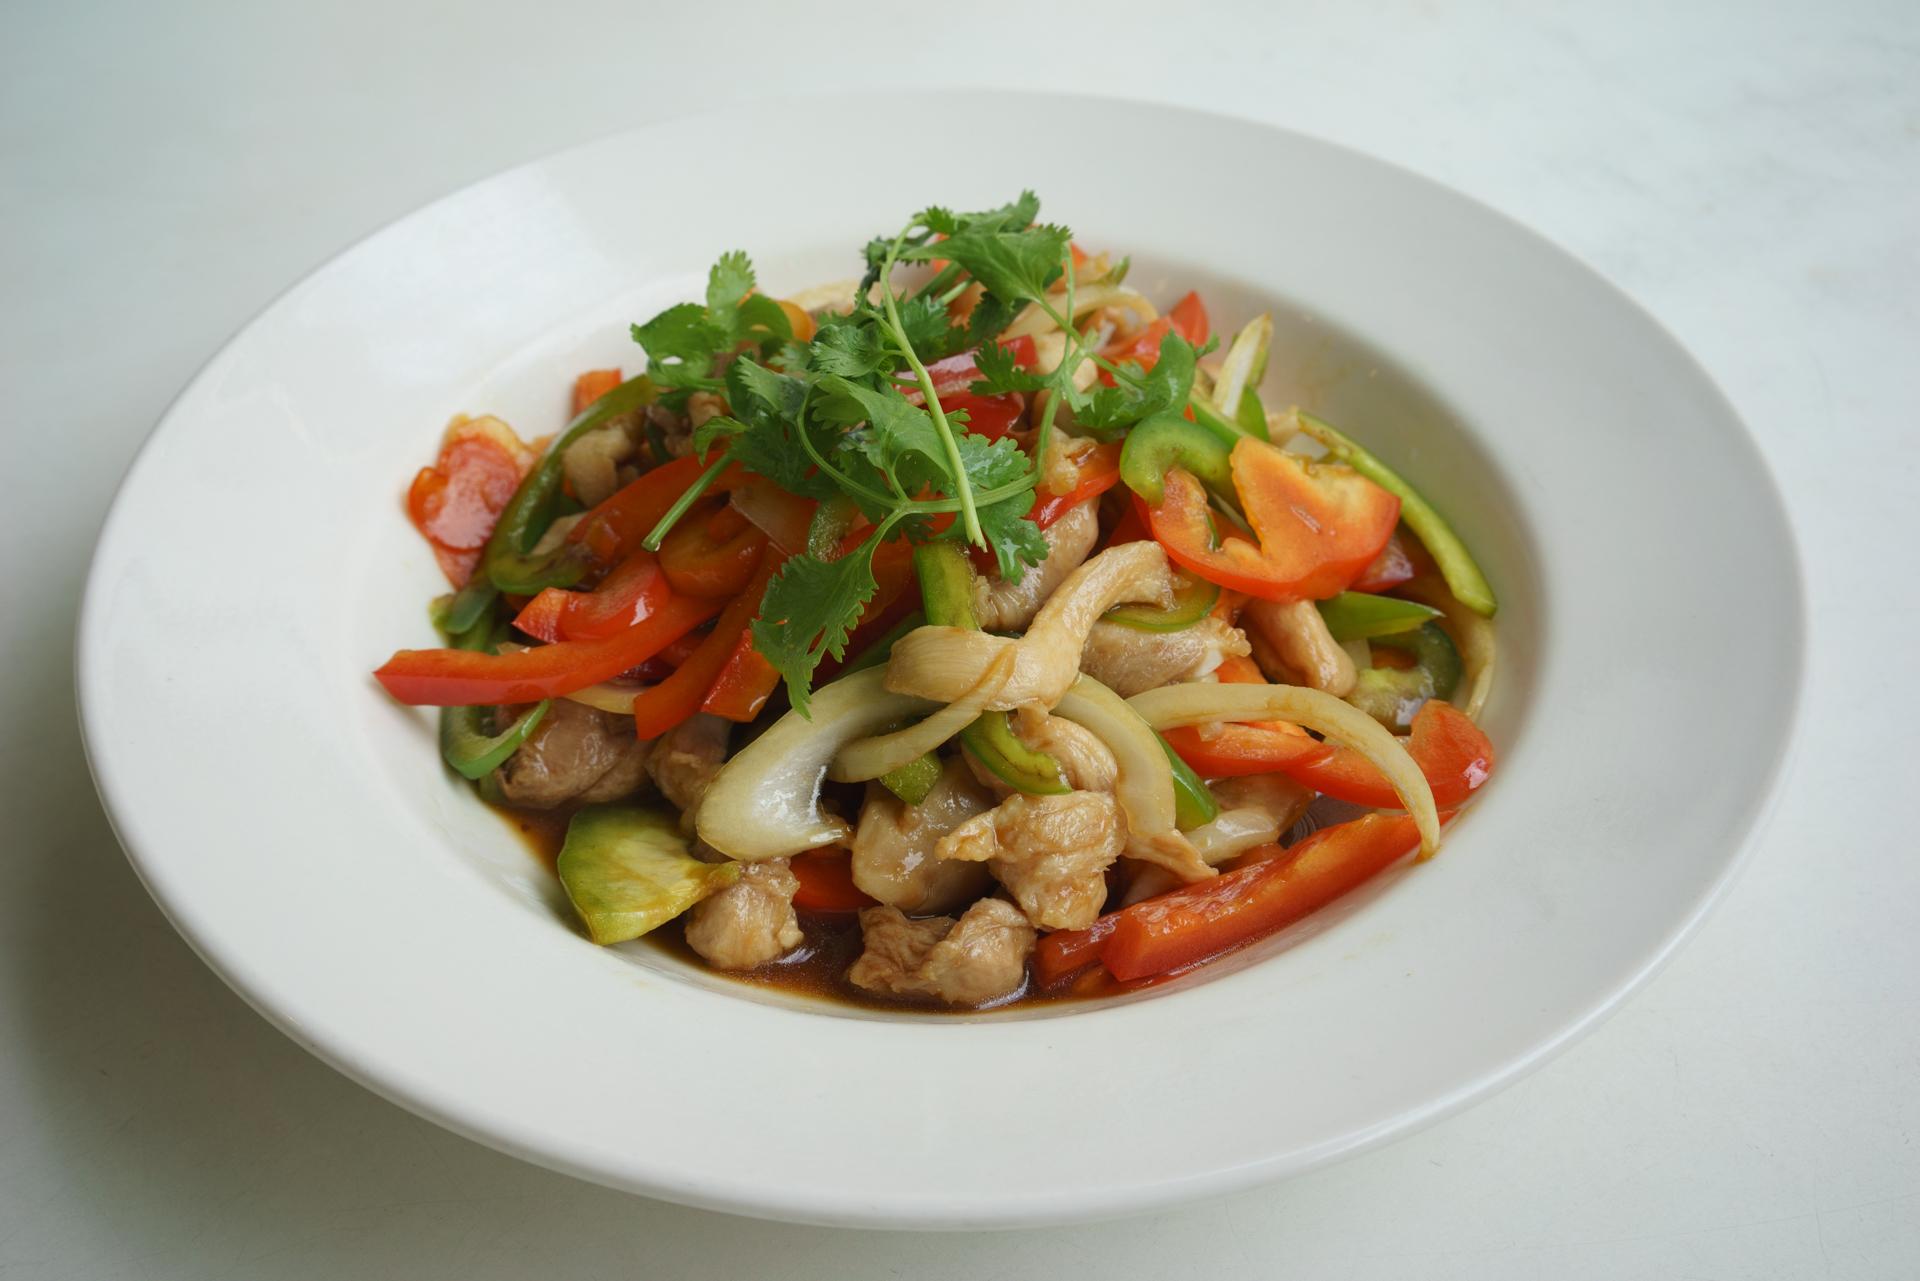 chicken stir fried with lemongrass ~ ga, bo xao xa ot